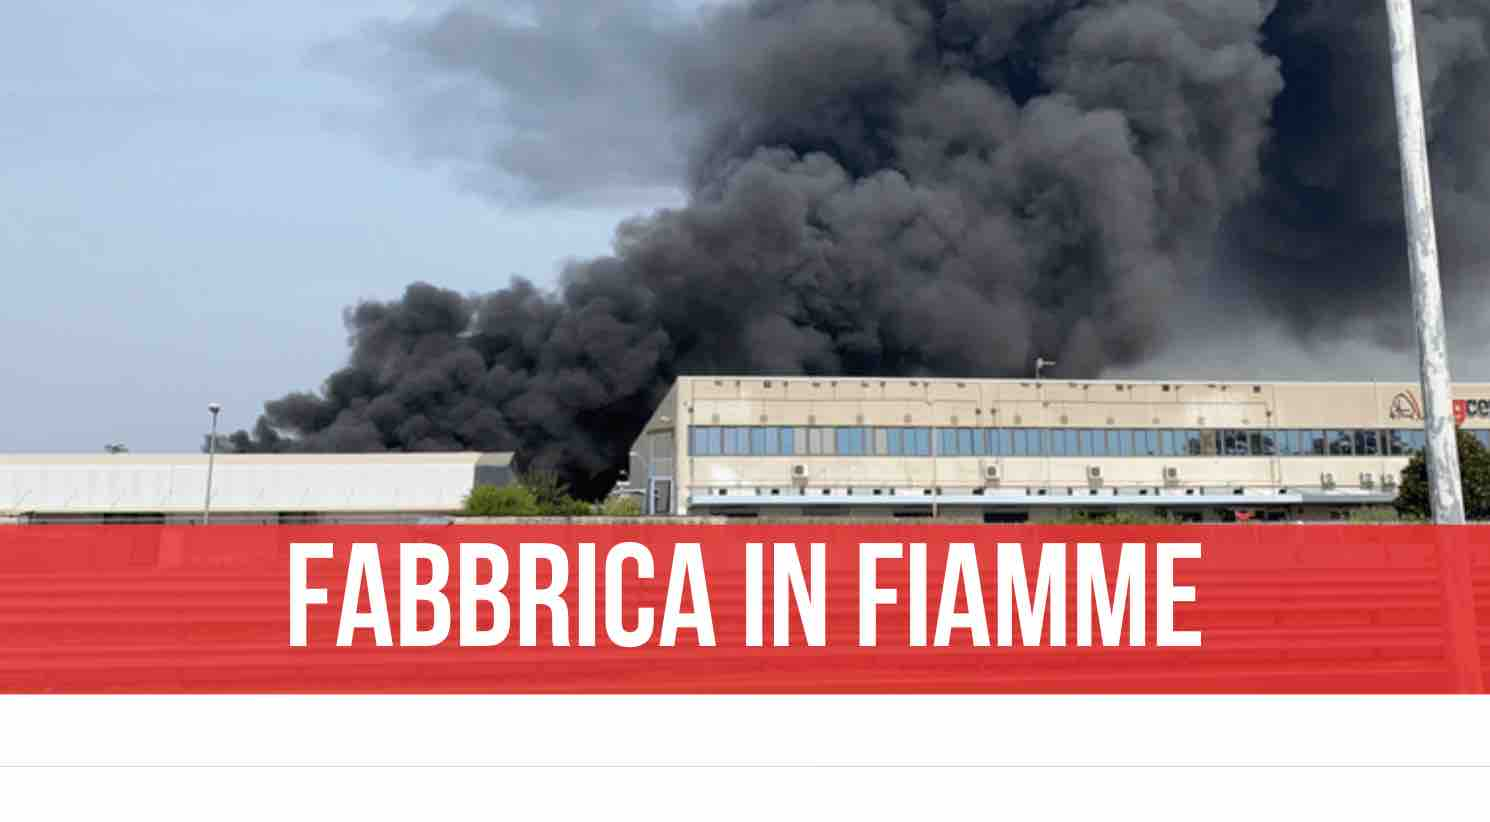 incendio fabbrica teverola